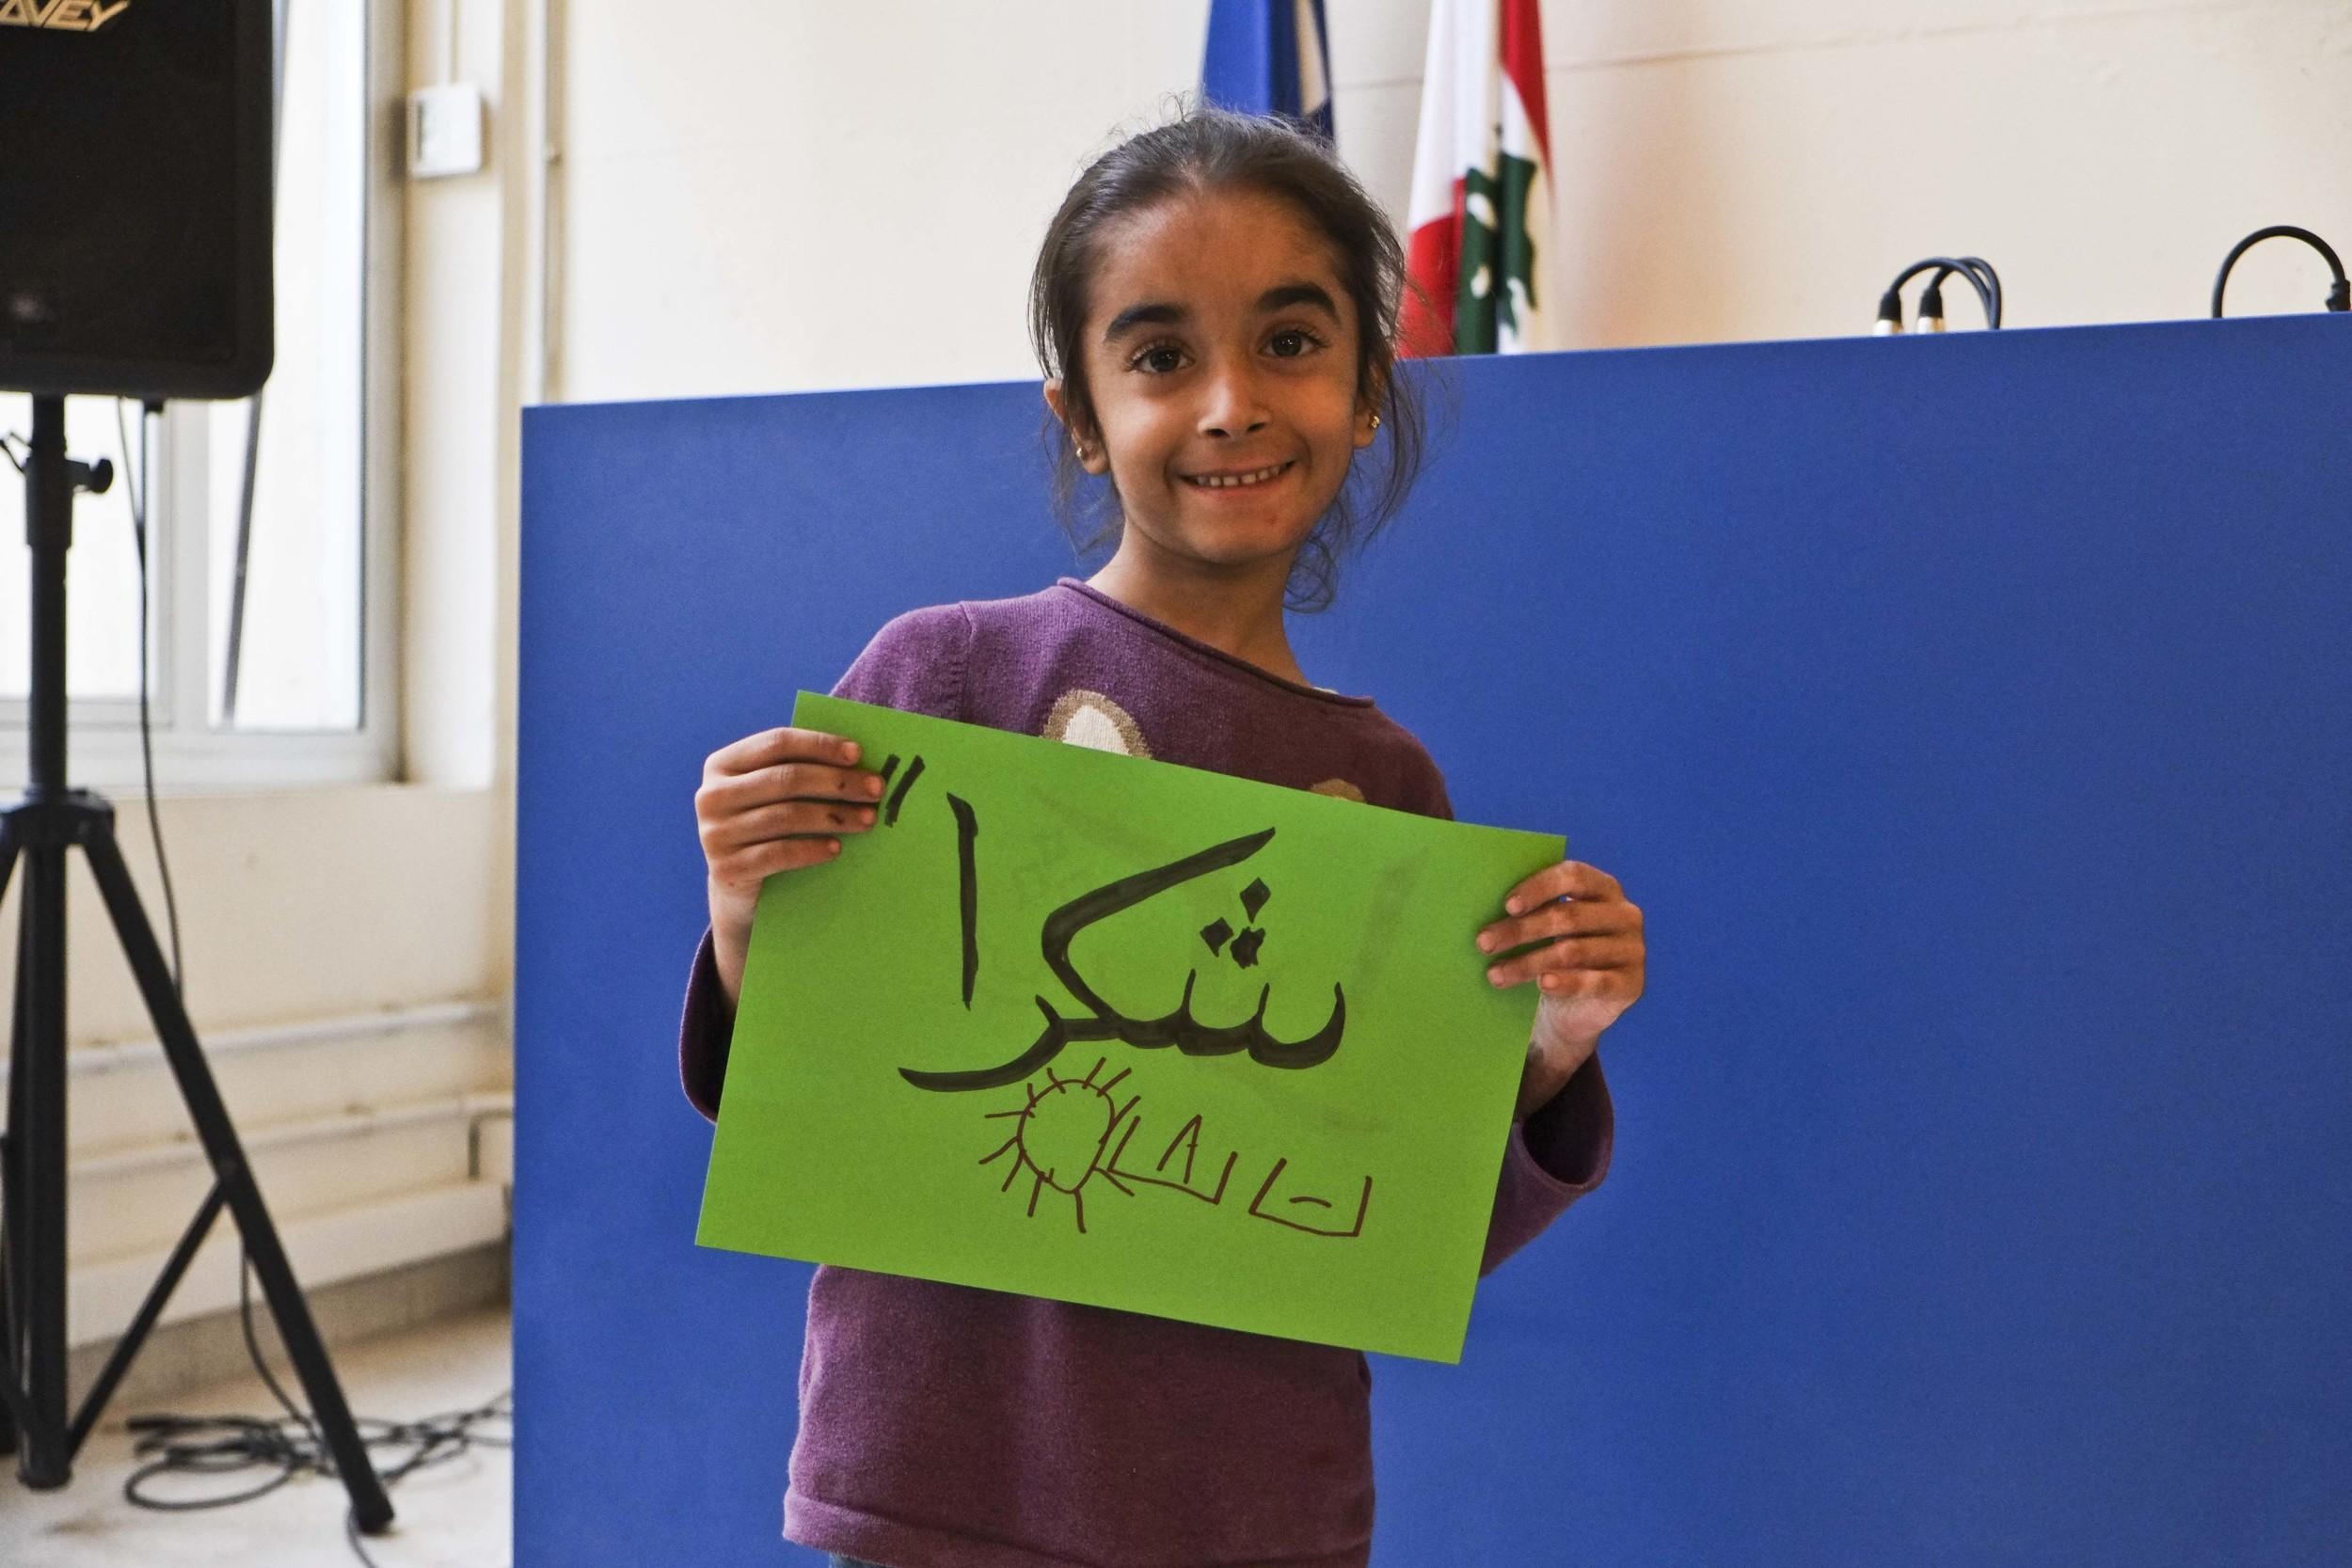 Ritaj INARA Arwa Damon syrian refugees NGO